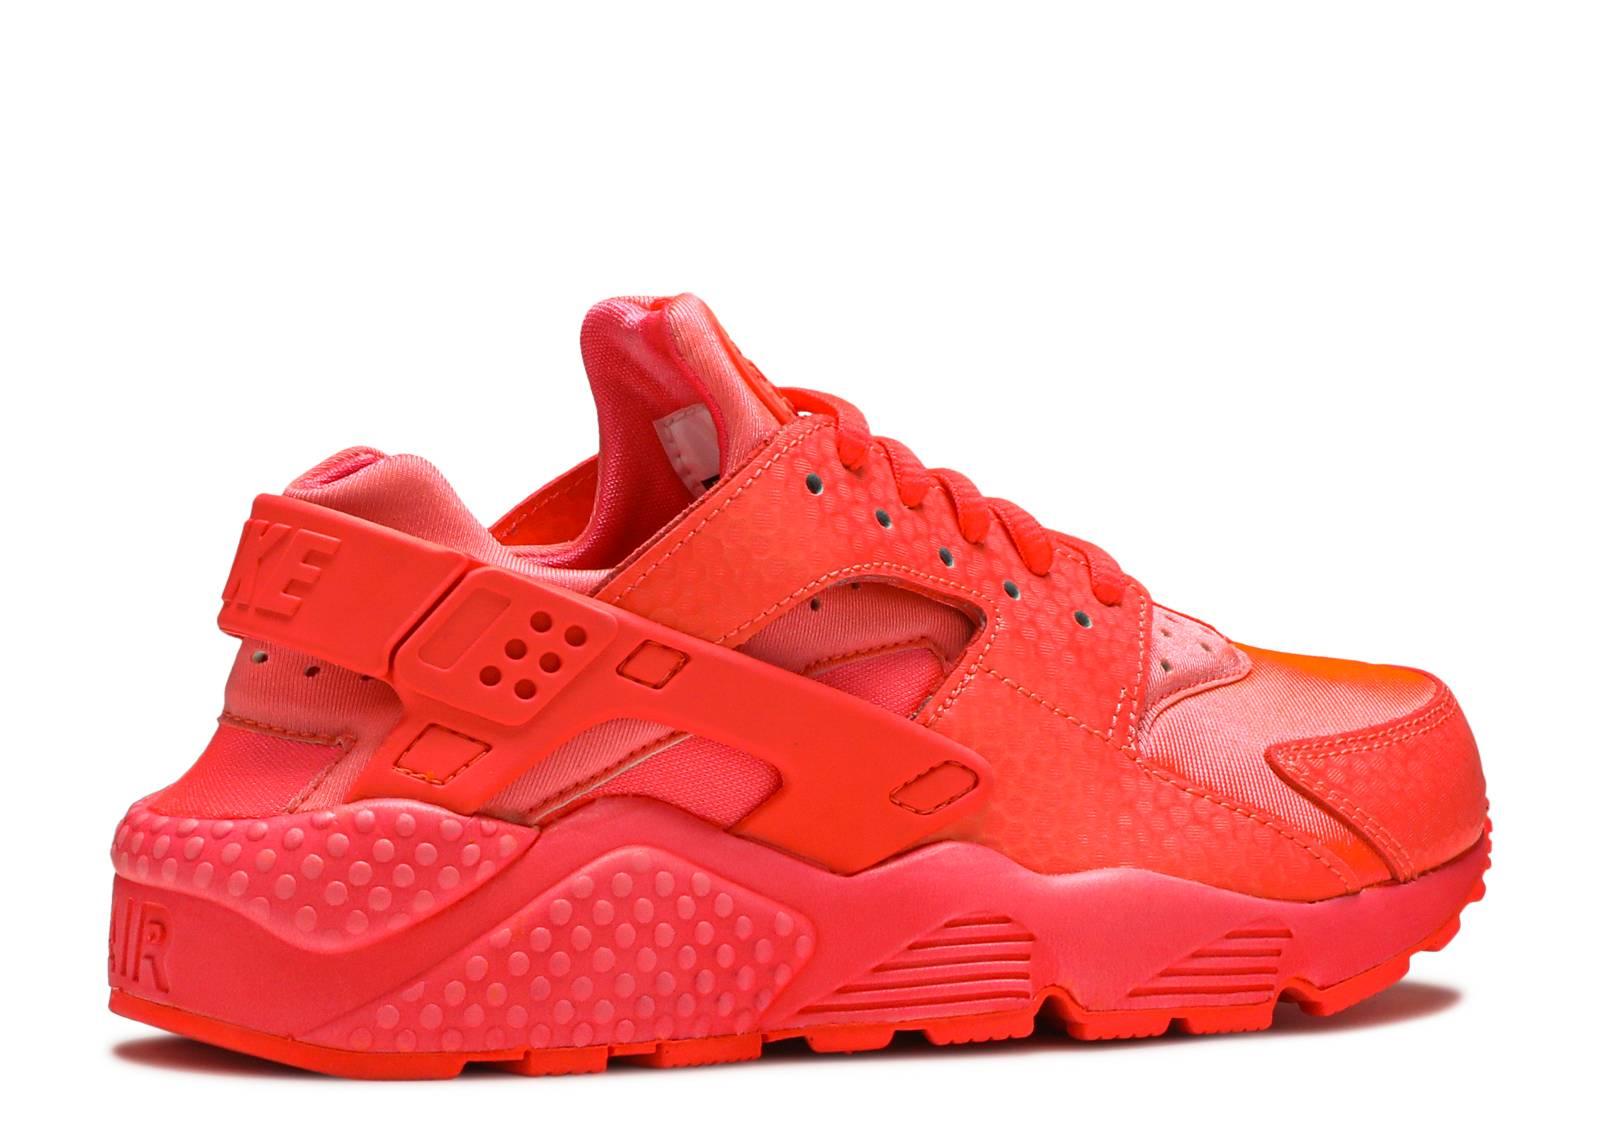 finest selection 71e15 12598 Ws air huarache run nike hot lava hot lava flight club jpg 2877x2055 Red hot  lava